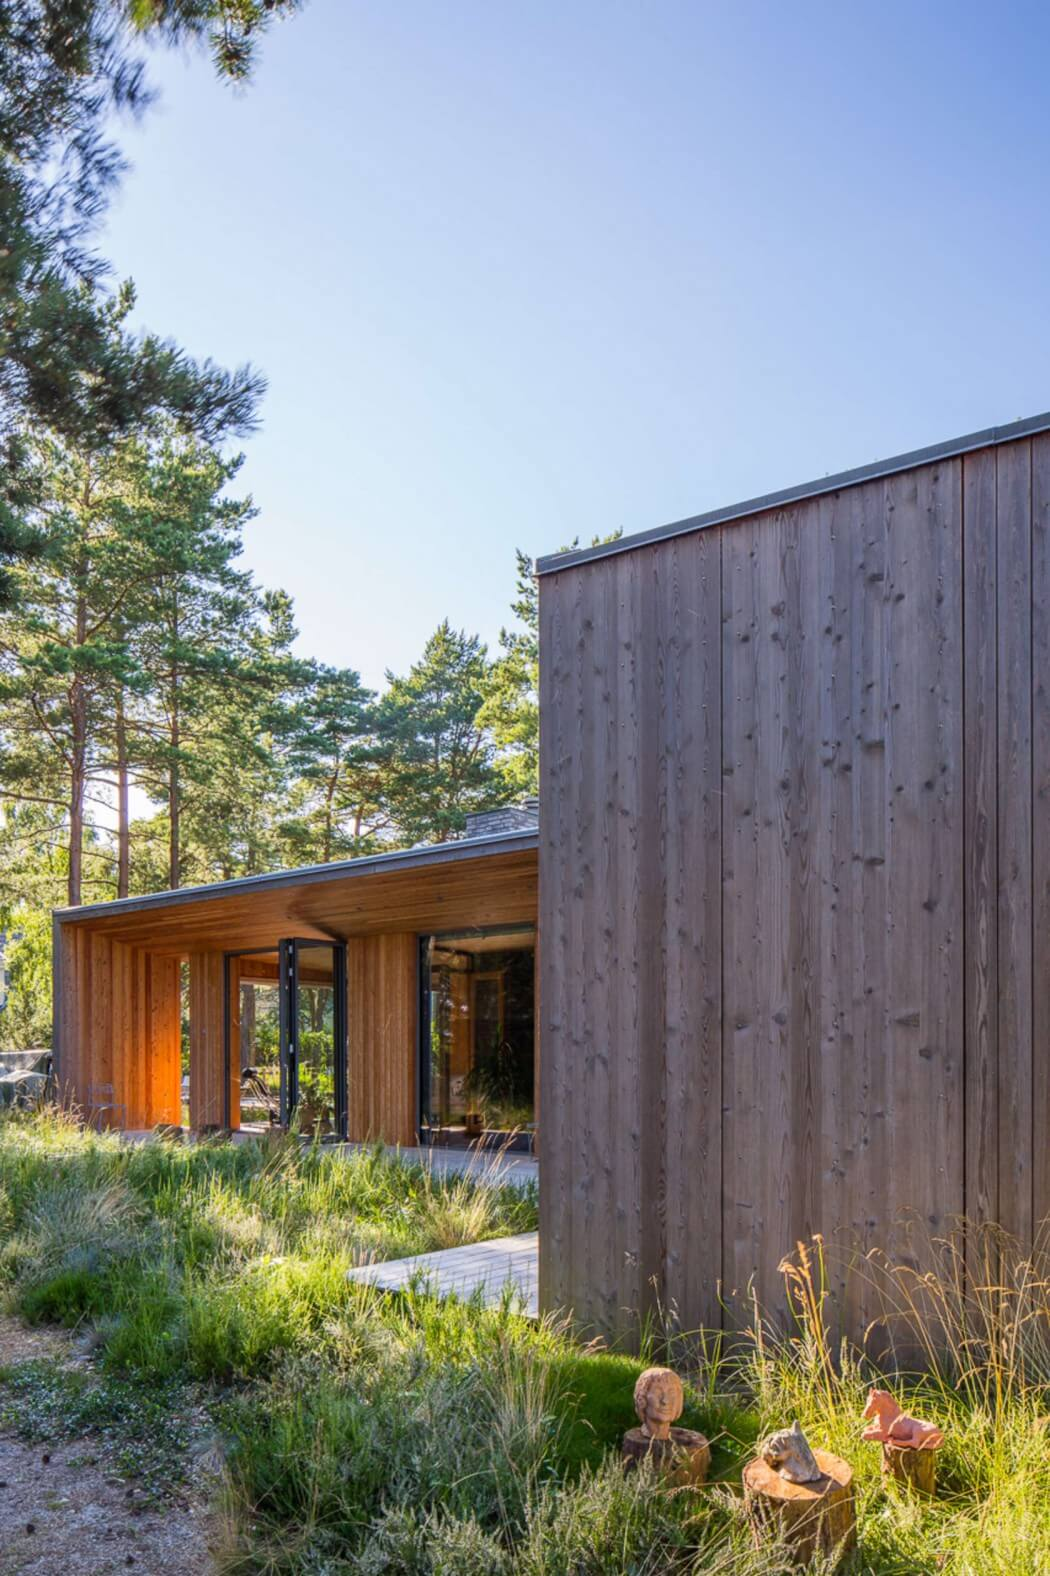 017-villa-ljung-johan-sundberg-arkitektur-1050x1576